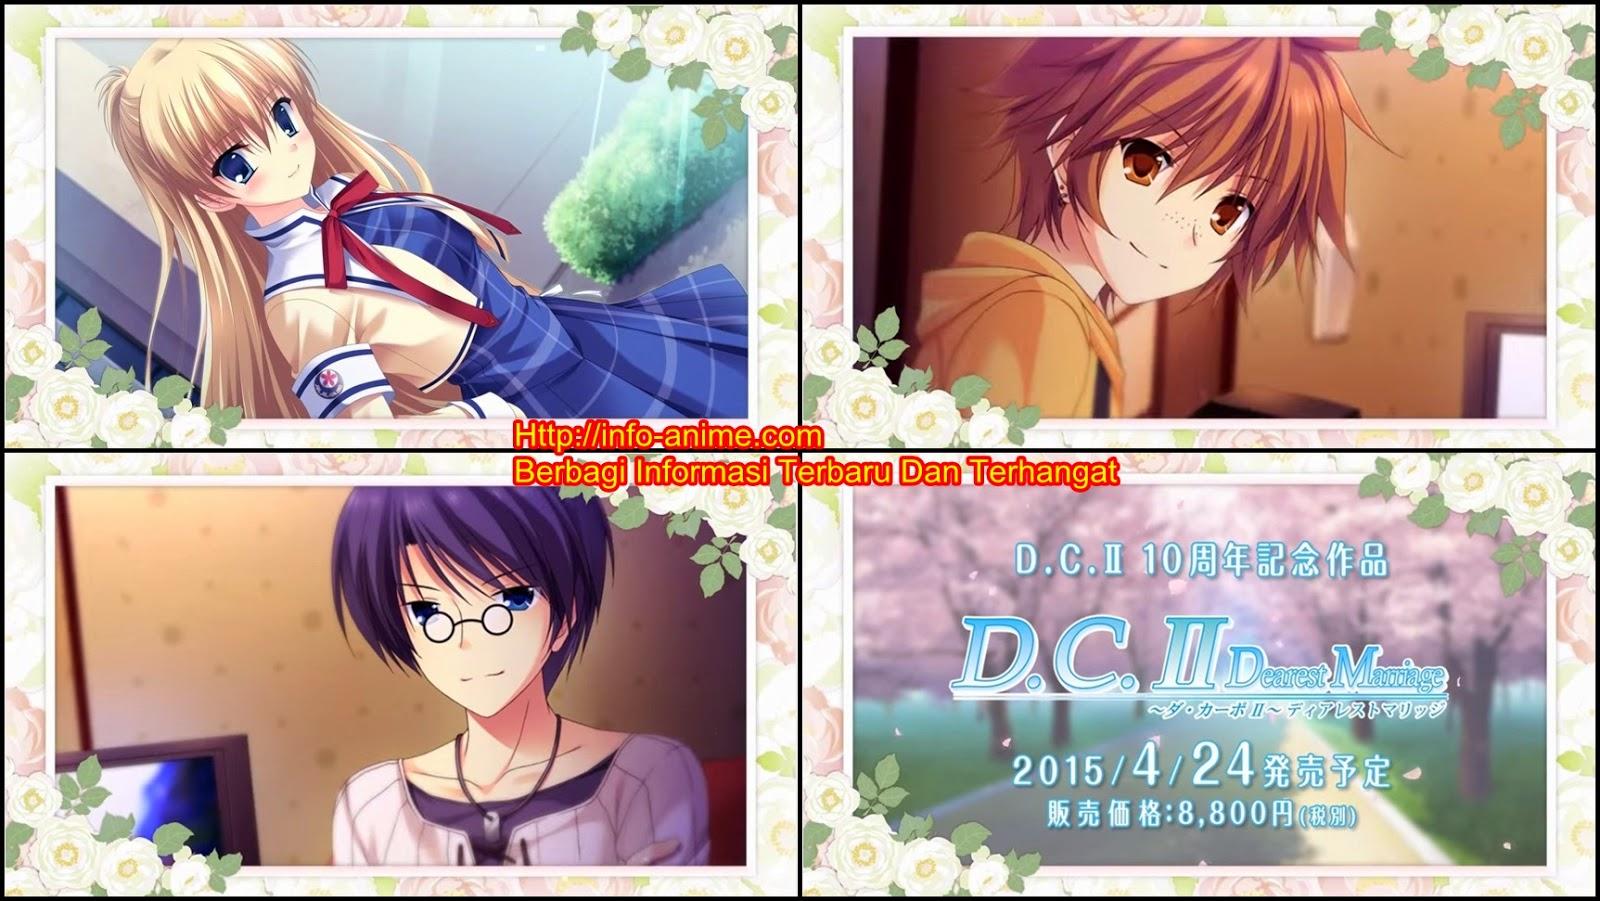 [ Info-Anime ] Game Visual Novel Da Capo II Dearest Marriage Tayangkan Trailer Baru